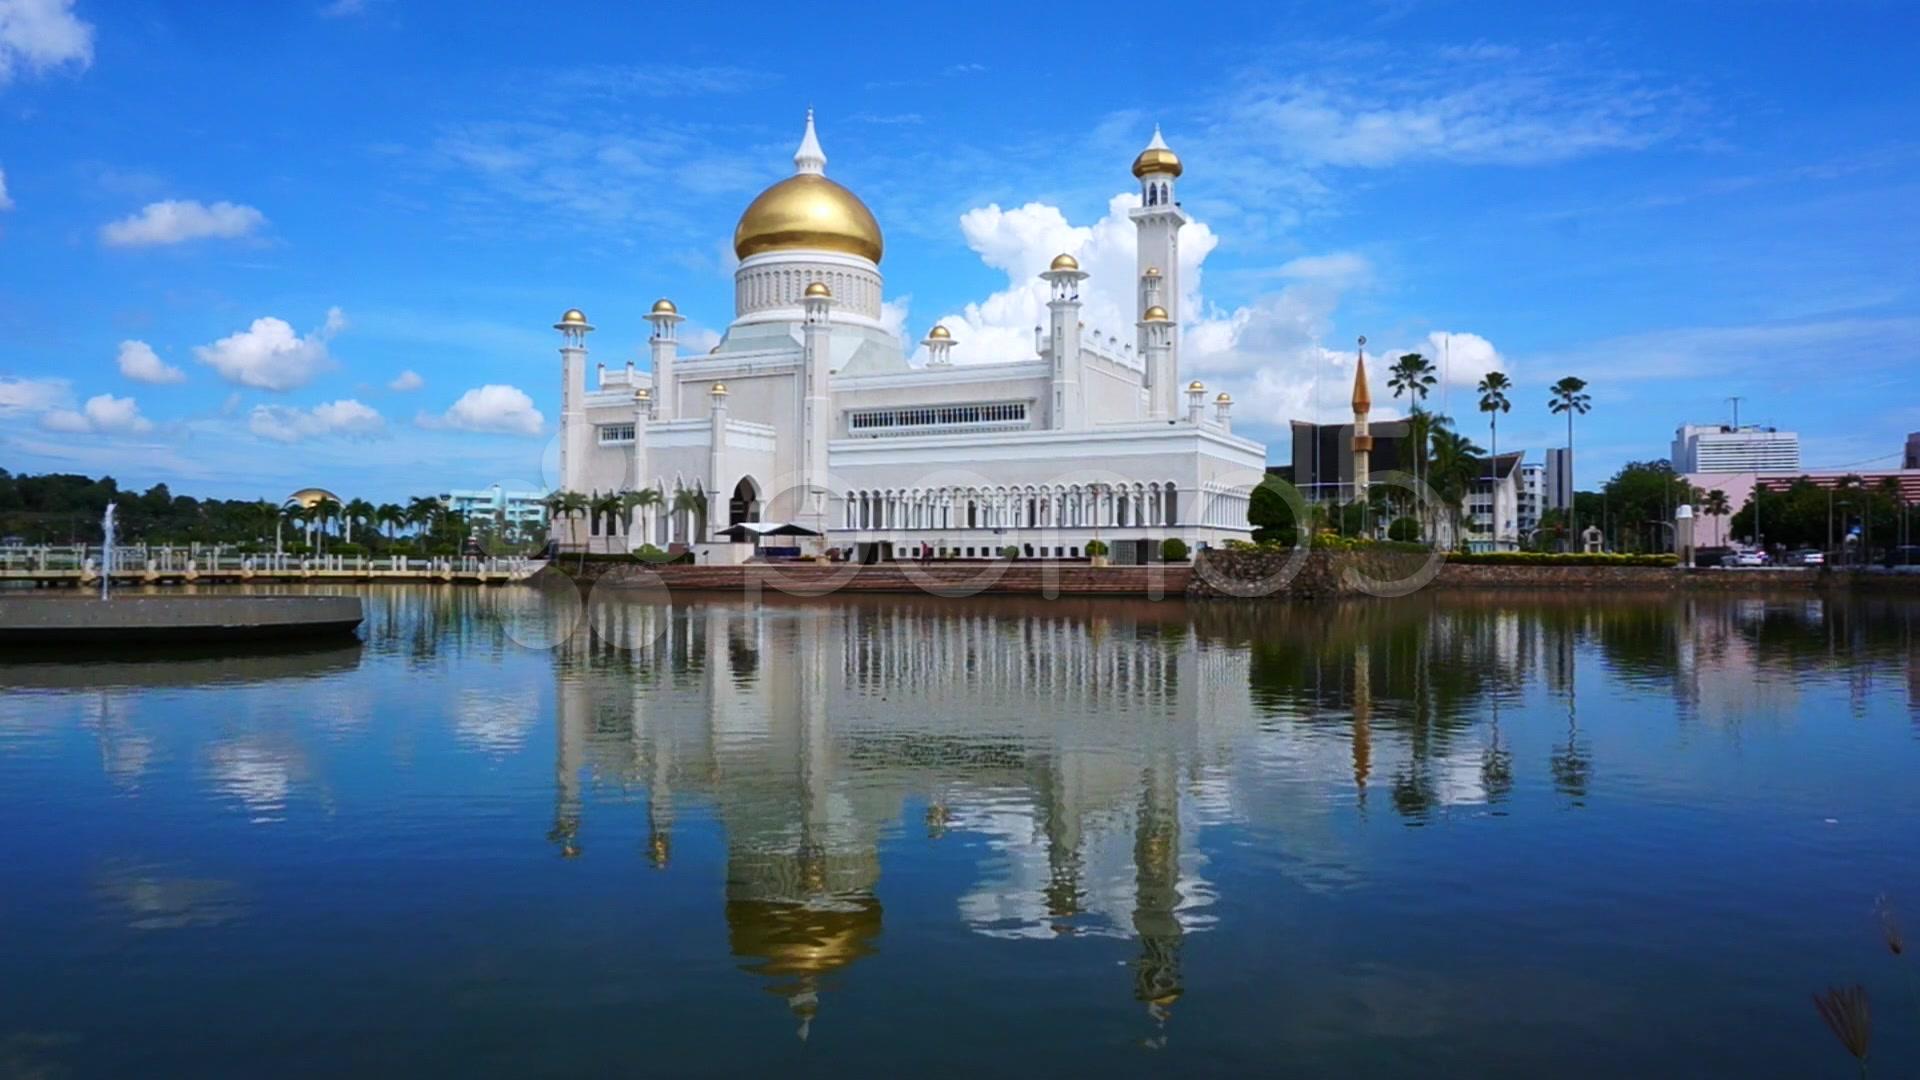 New Zealand Mosque Wikipedia: Masjid Omar Brunei, Check Out Masjid Omar Brunei : CnTRAVEL